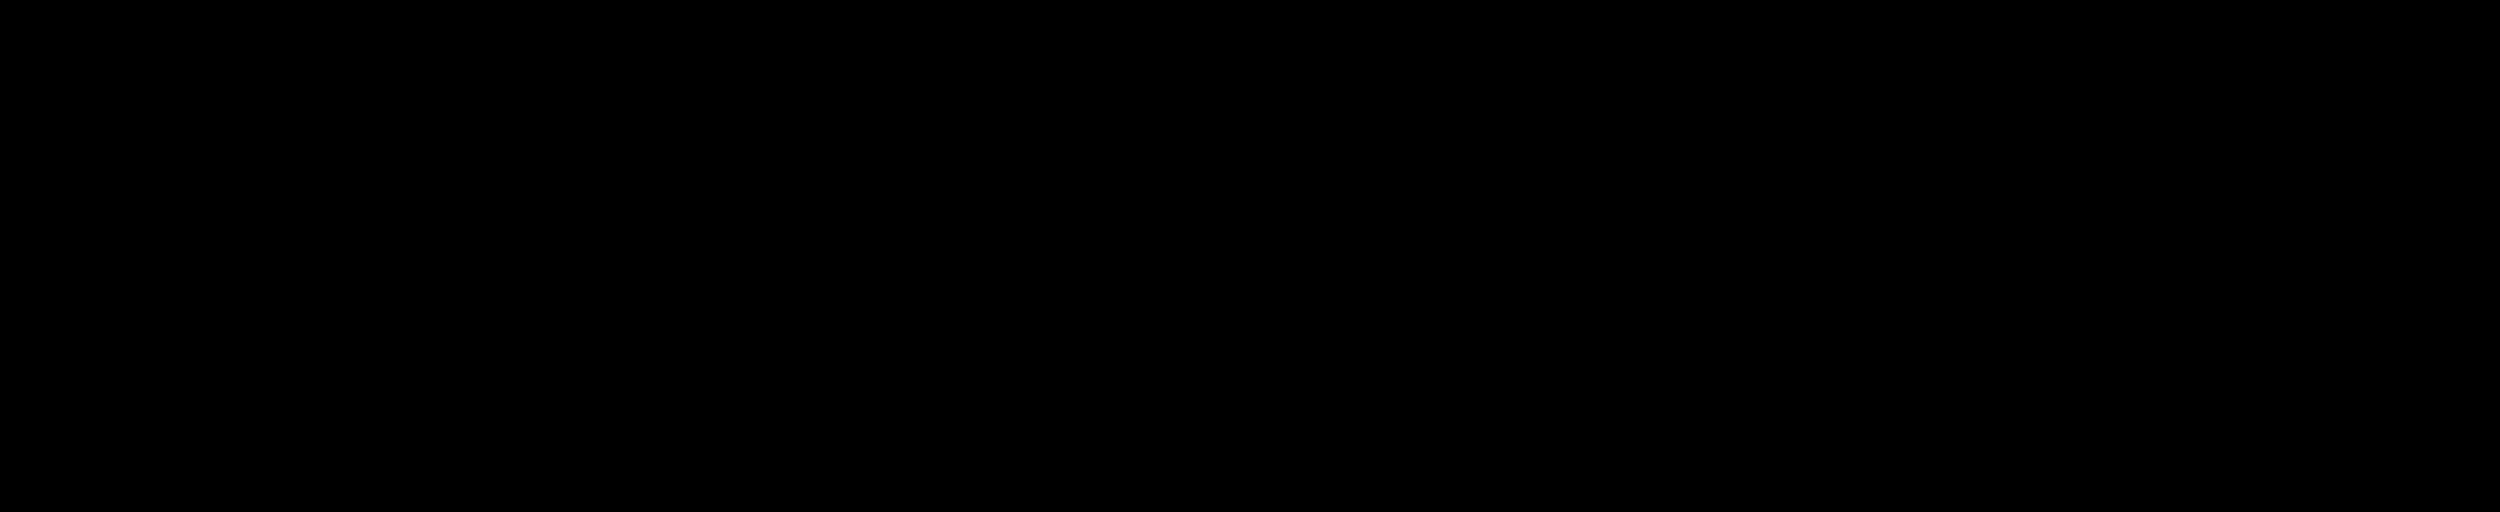 mrk-logo-new@4x.png